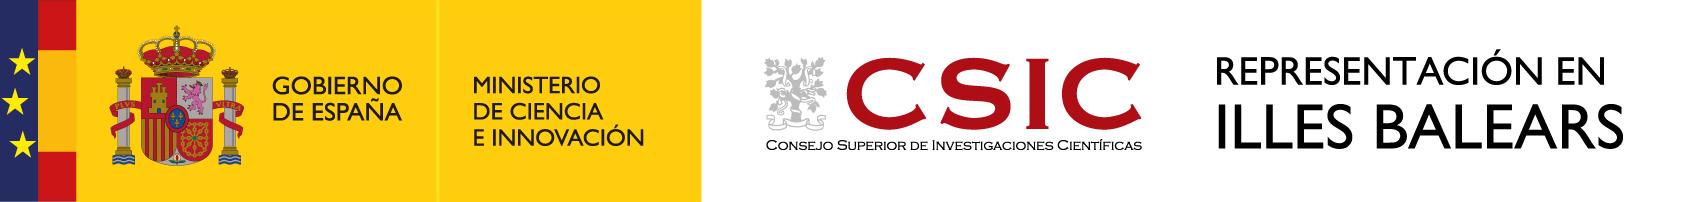 CSIC en Illes Balears